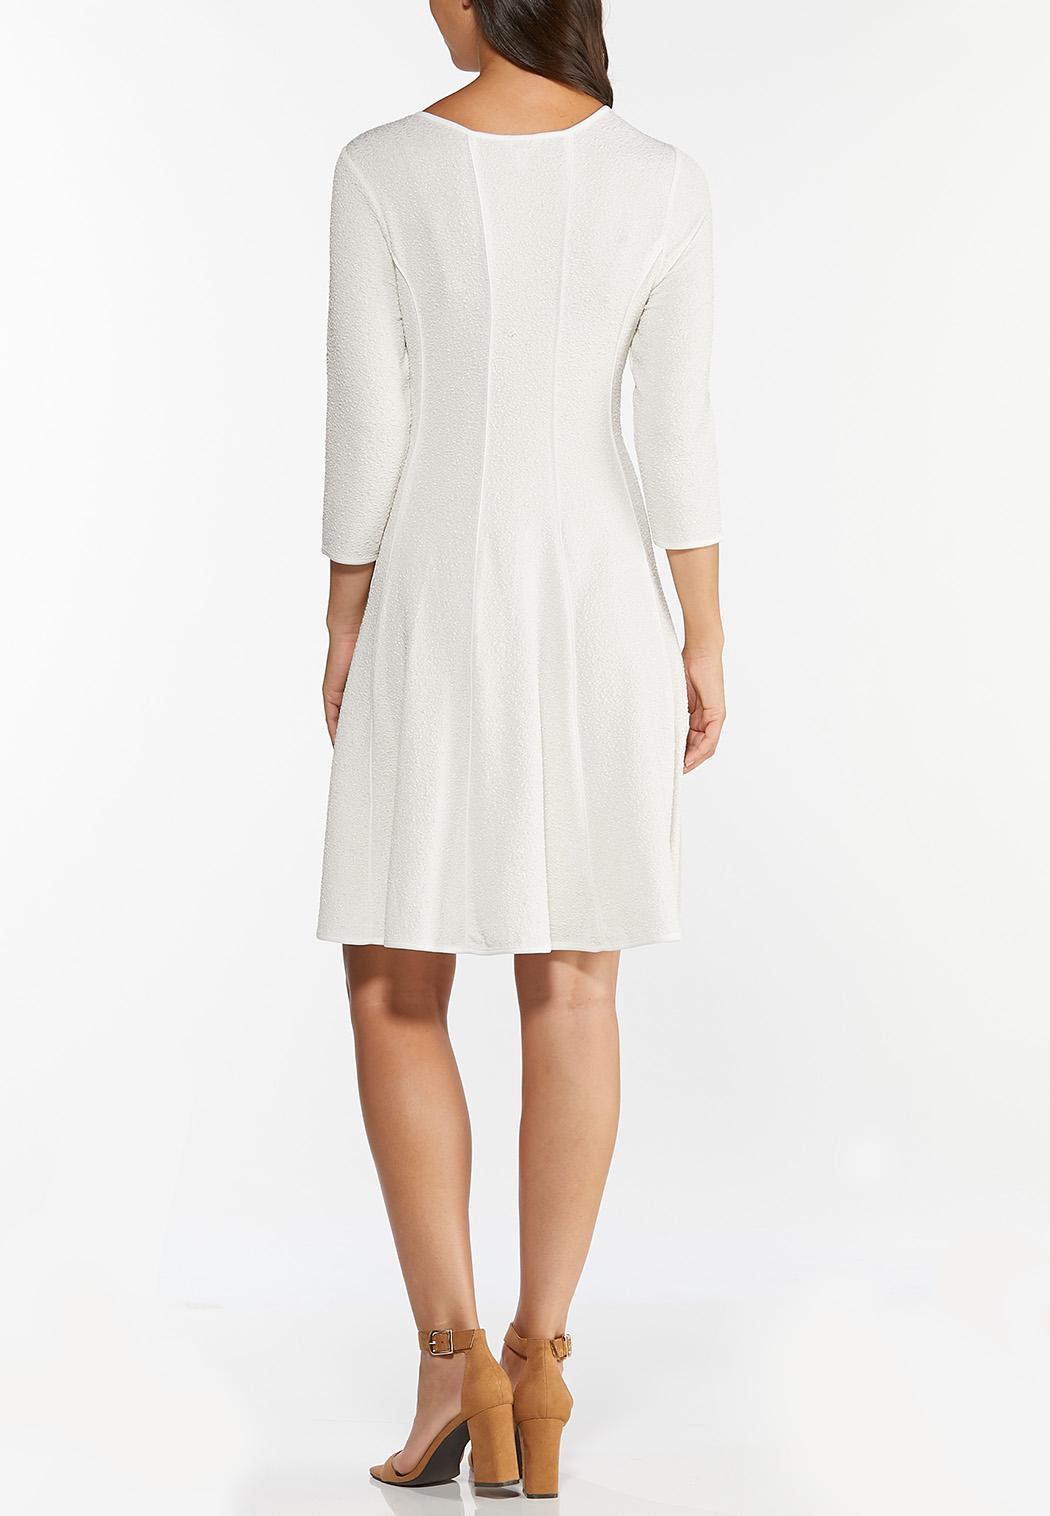 Plus Size Sparkle Ivory Seamed Dress (Item #44402955)